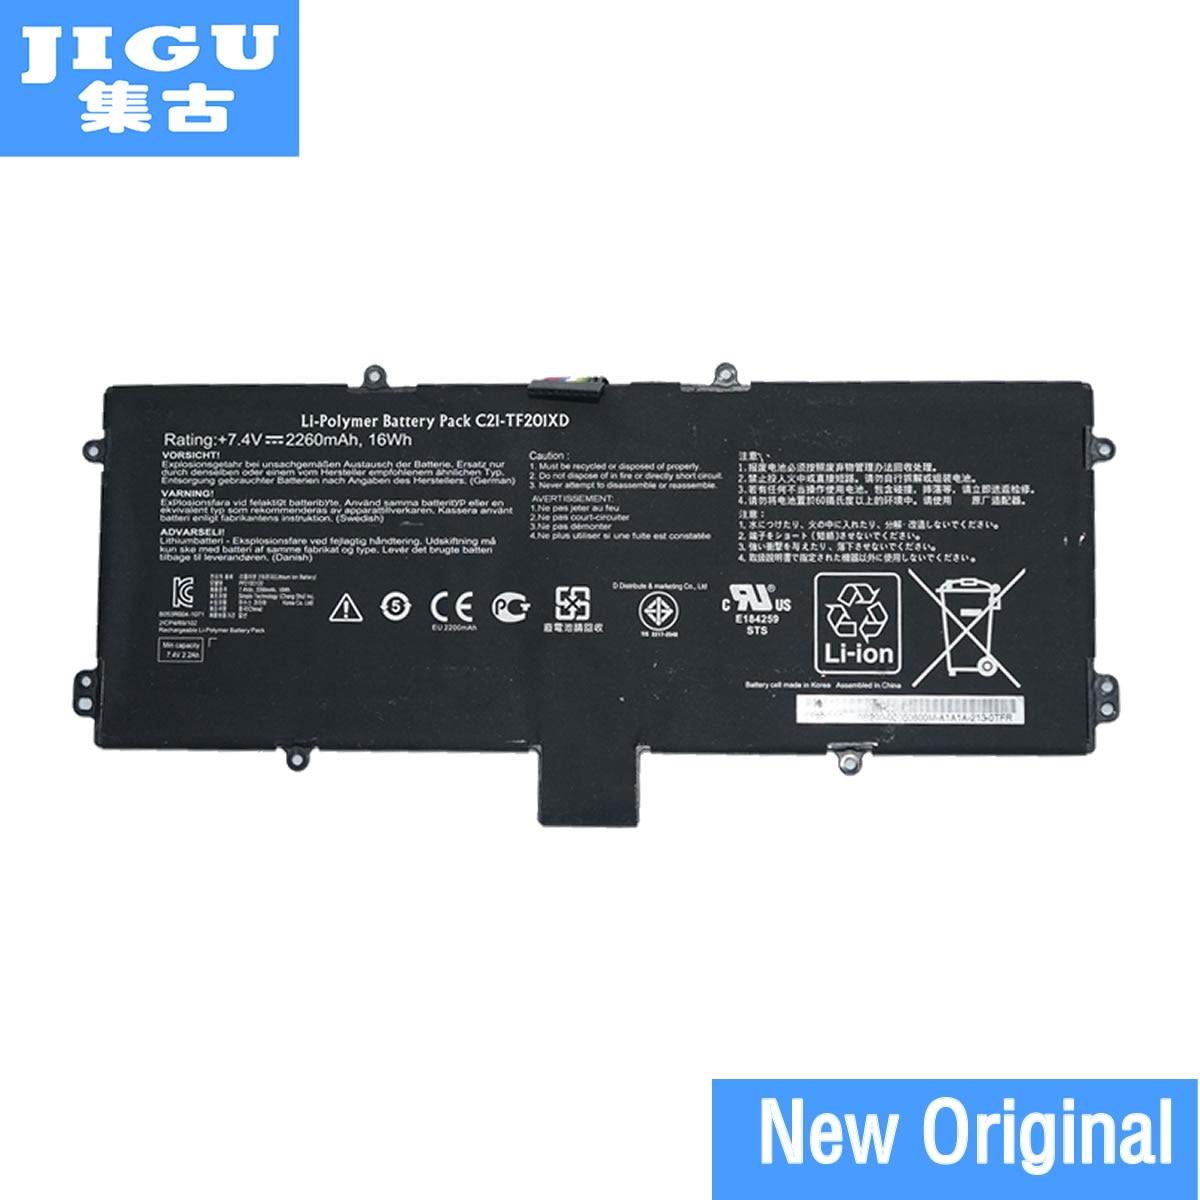 JIGU Original Laptop Battery C21-TF201XD C21-TF20IXD For ASUS For Eee Pad TF201 TF201XD цена